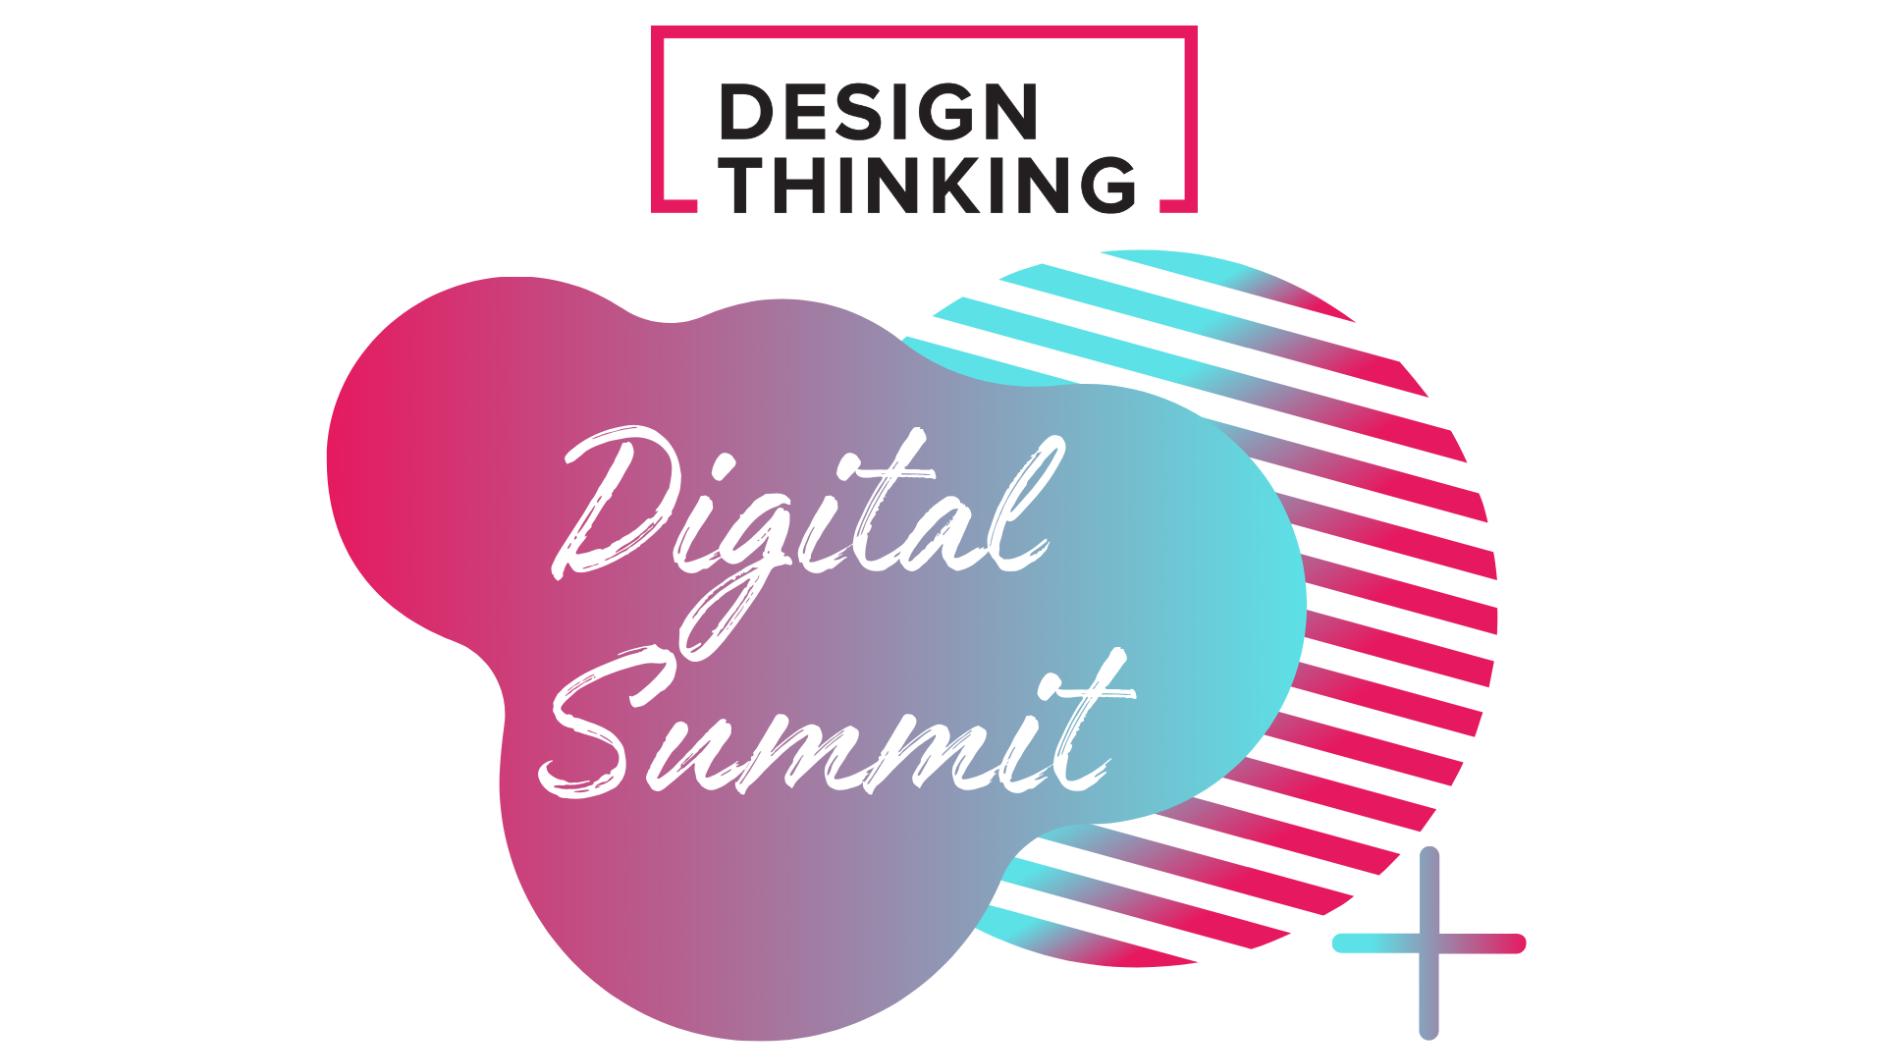 Design Thinking July Digital Summit